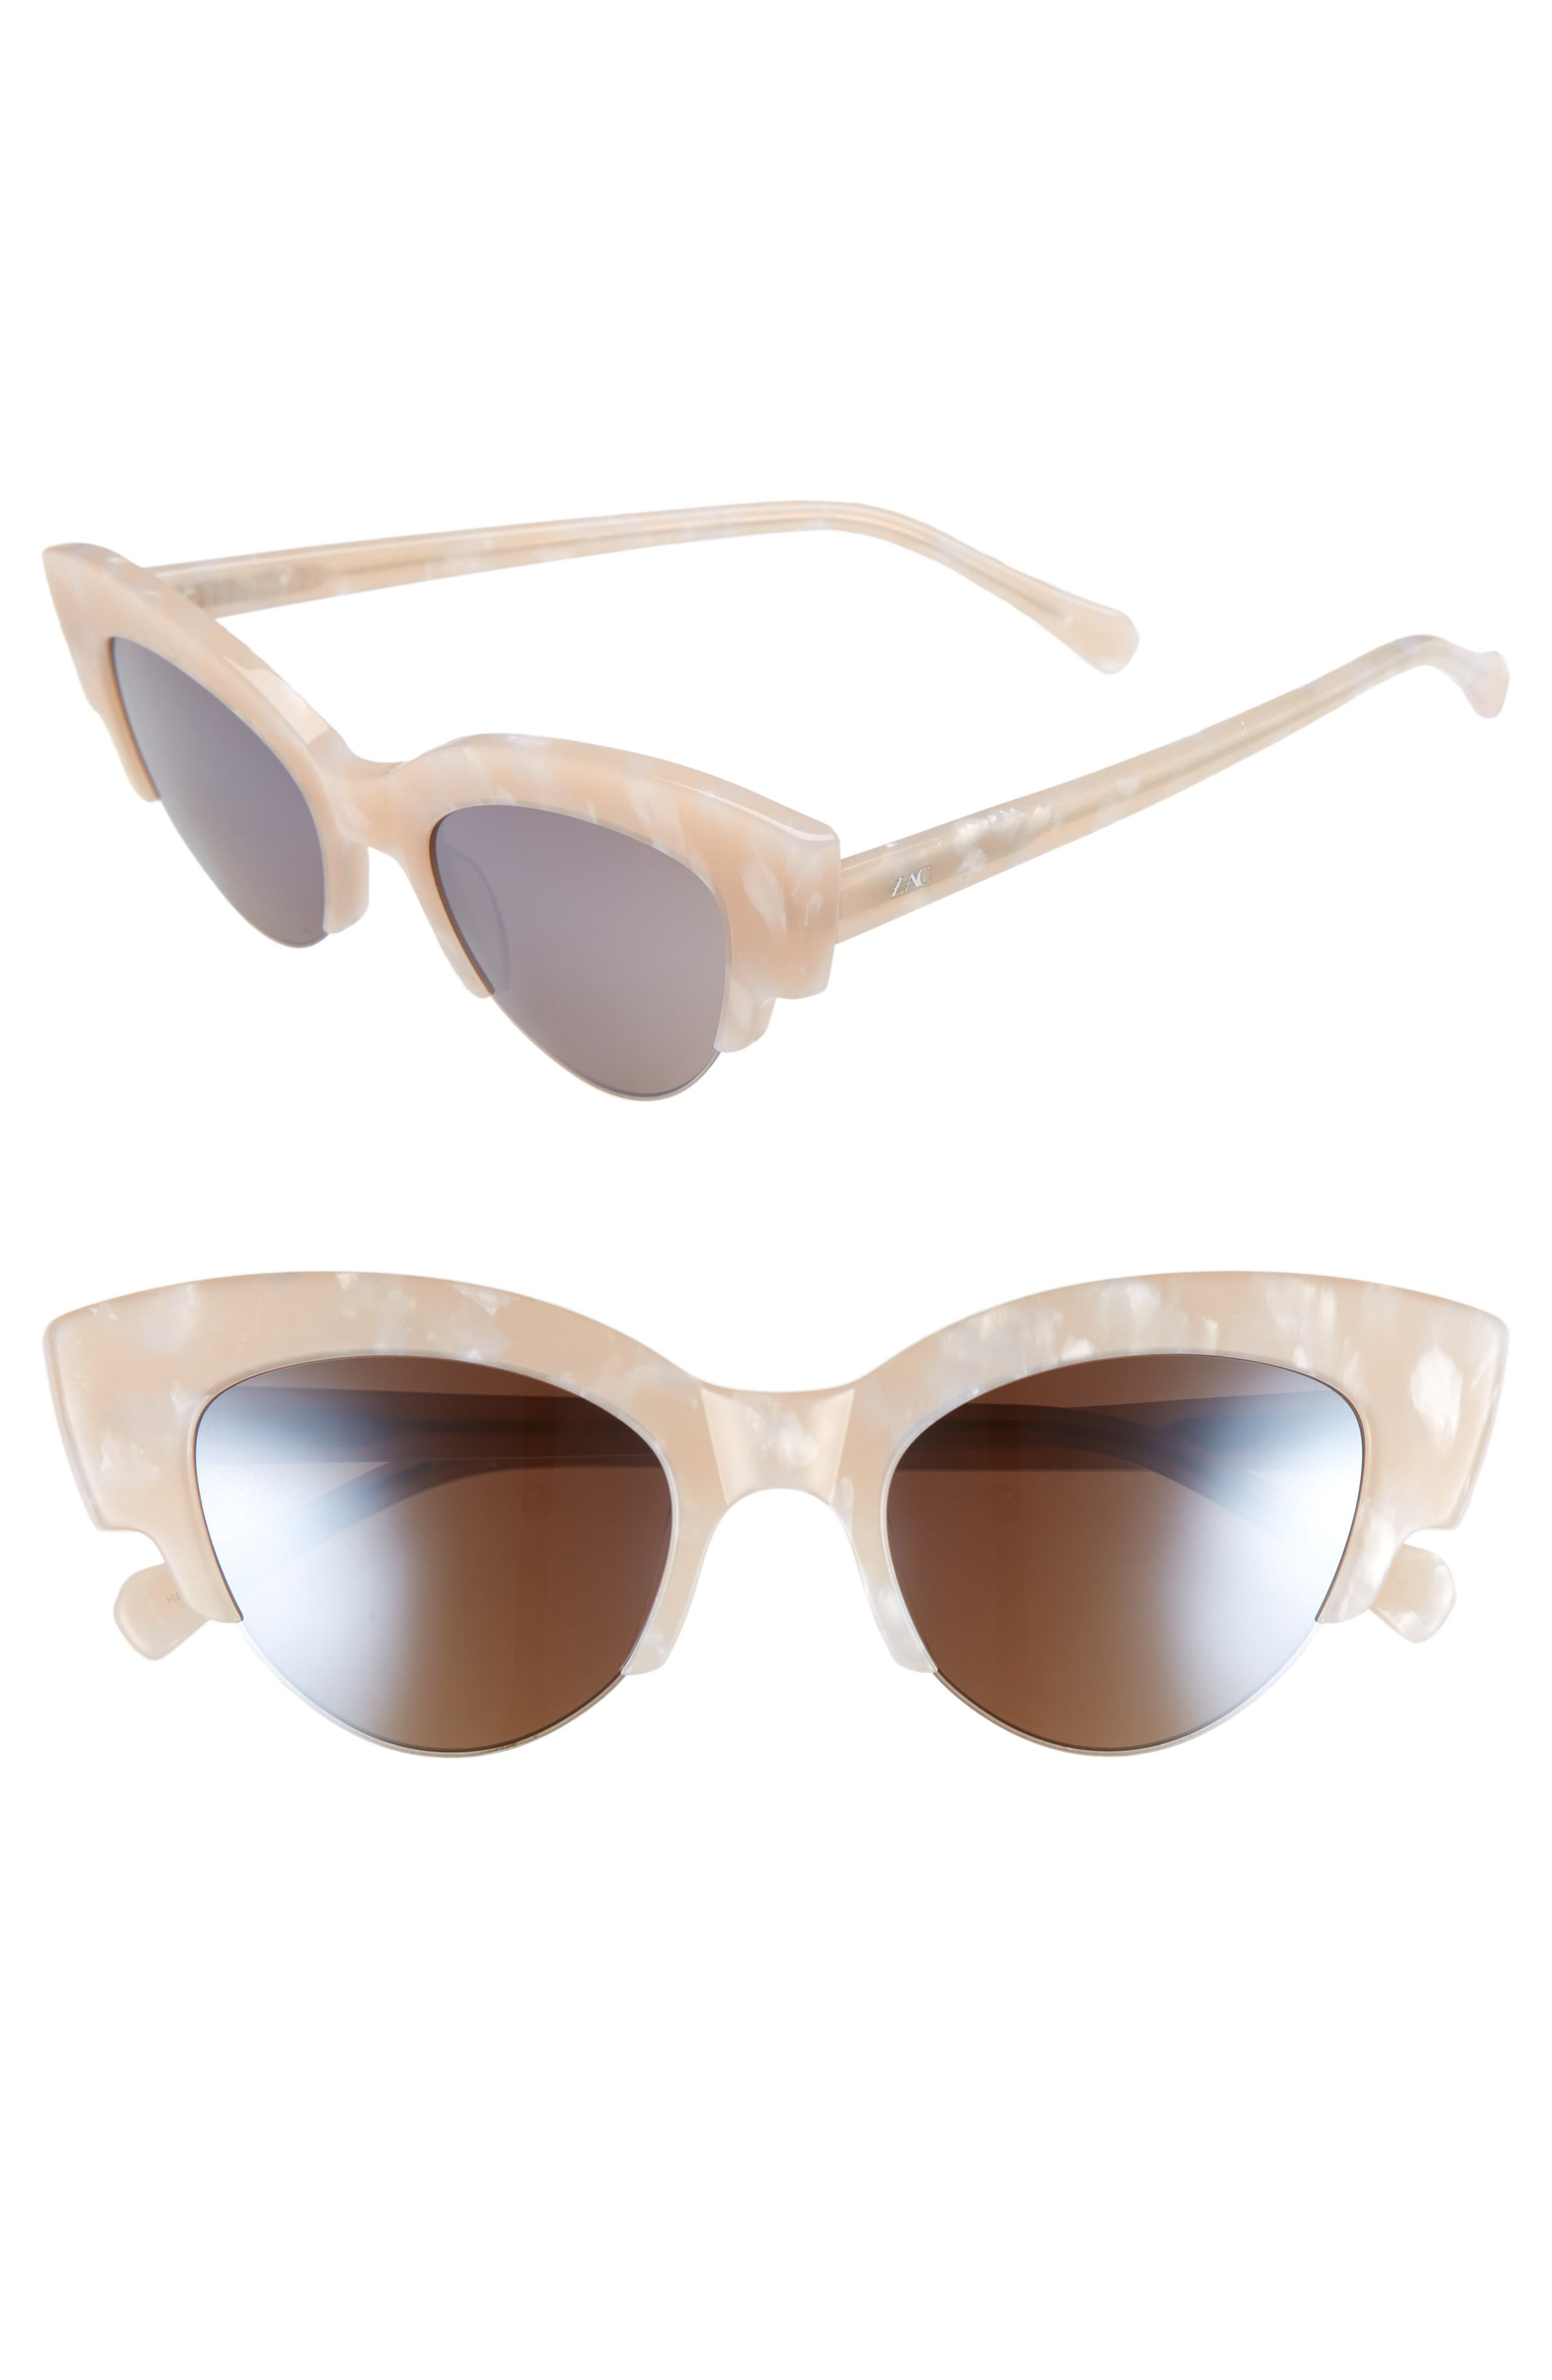 Winona Cat Eye Sunglasses,                         Main,                         color, Marble/ Cream